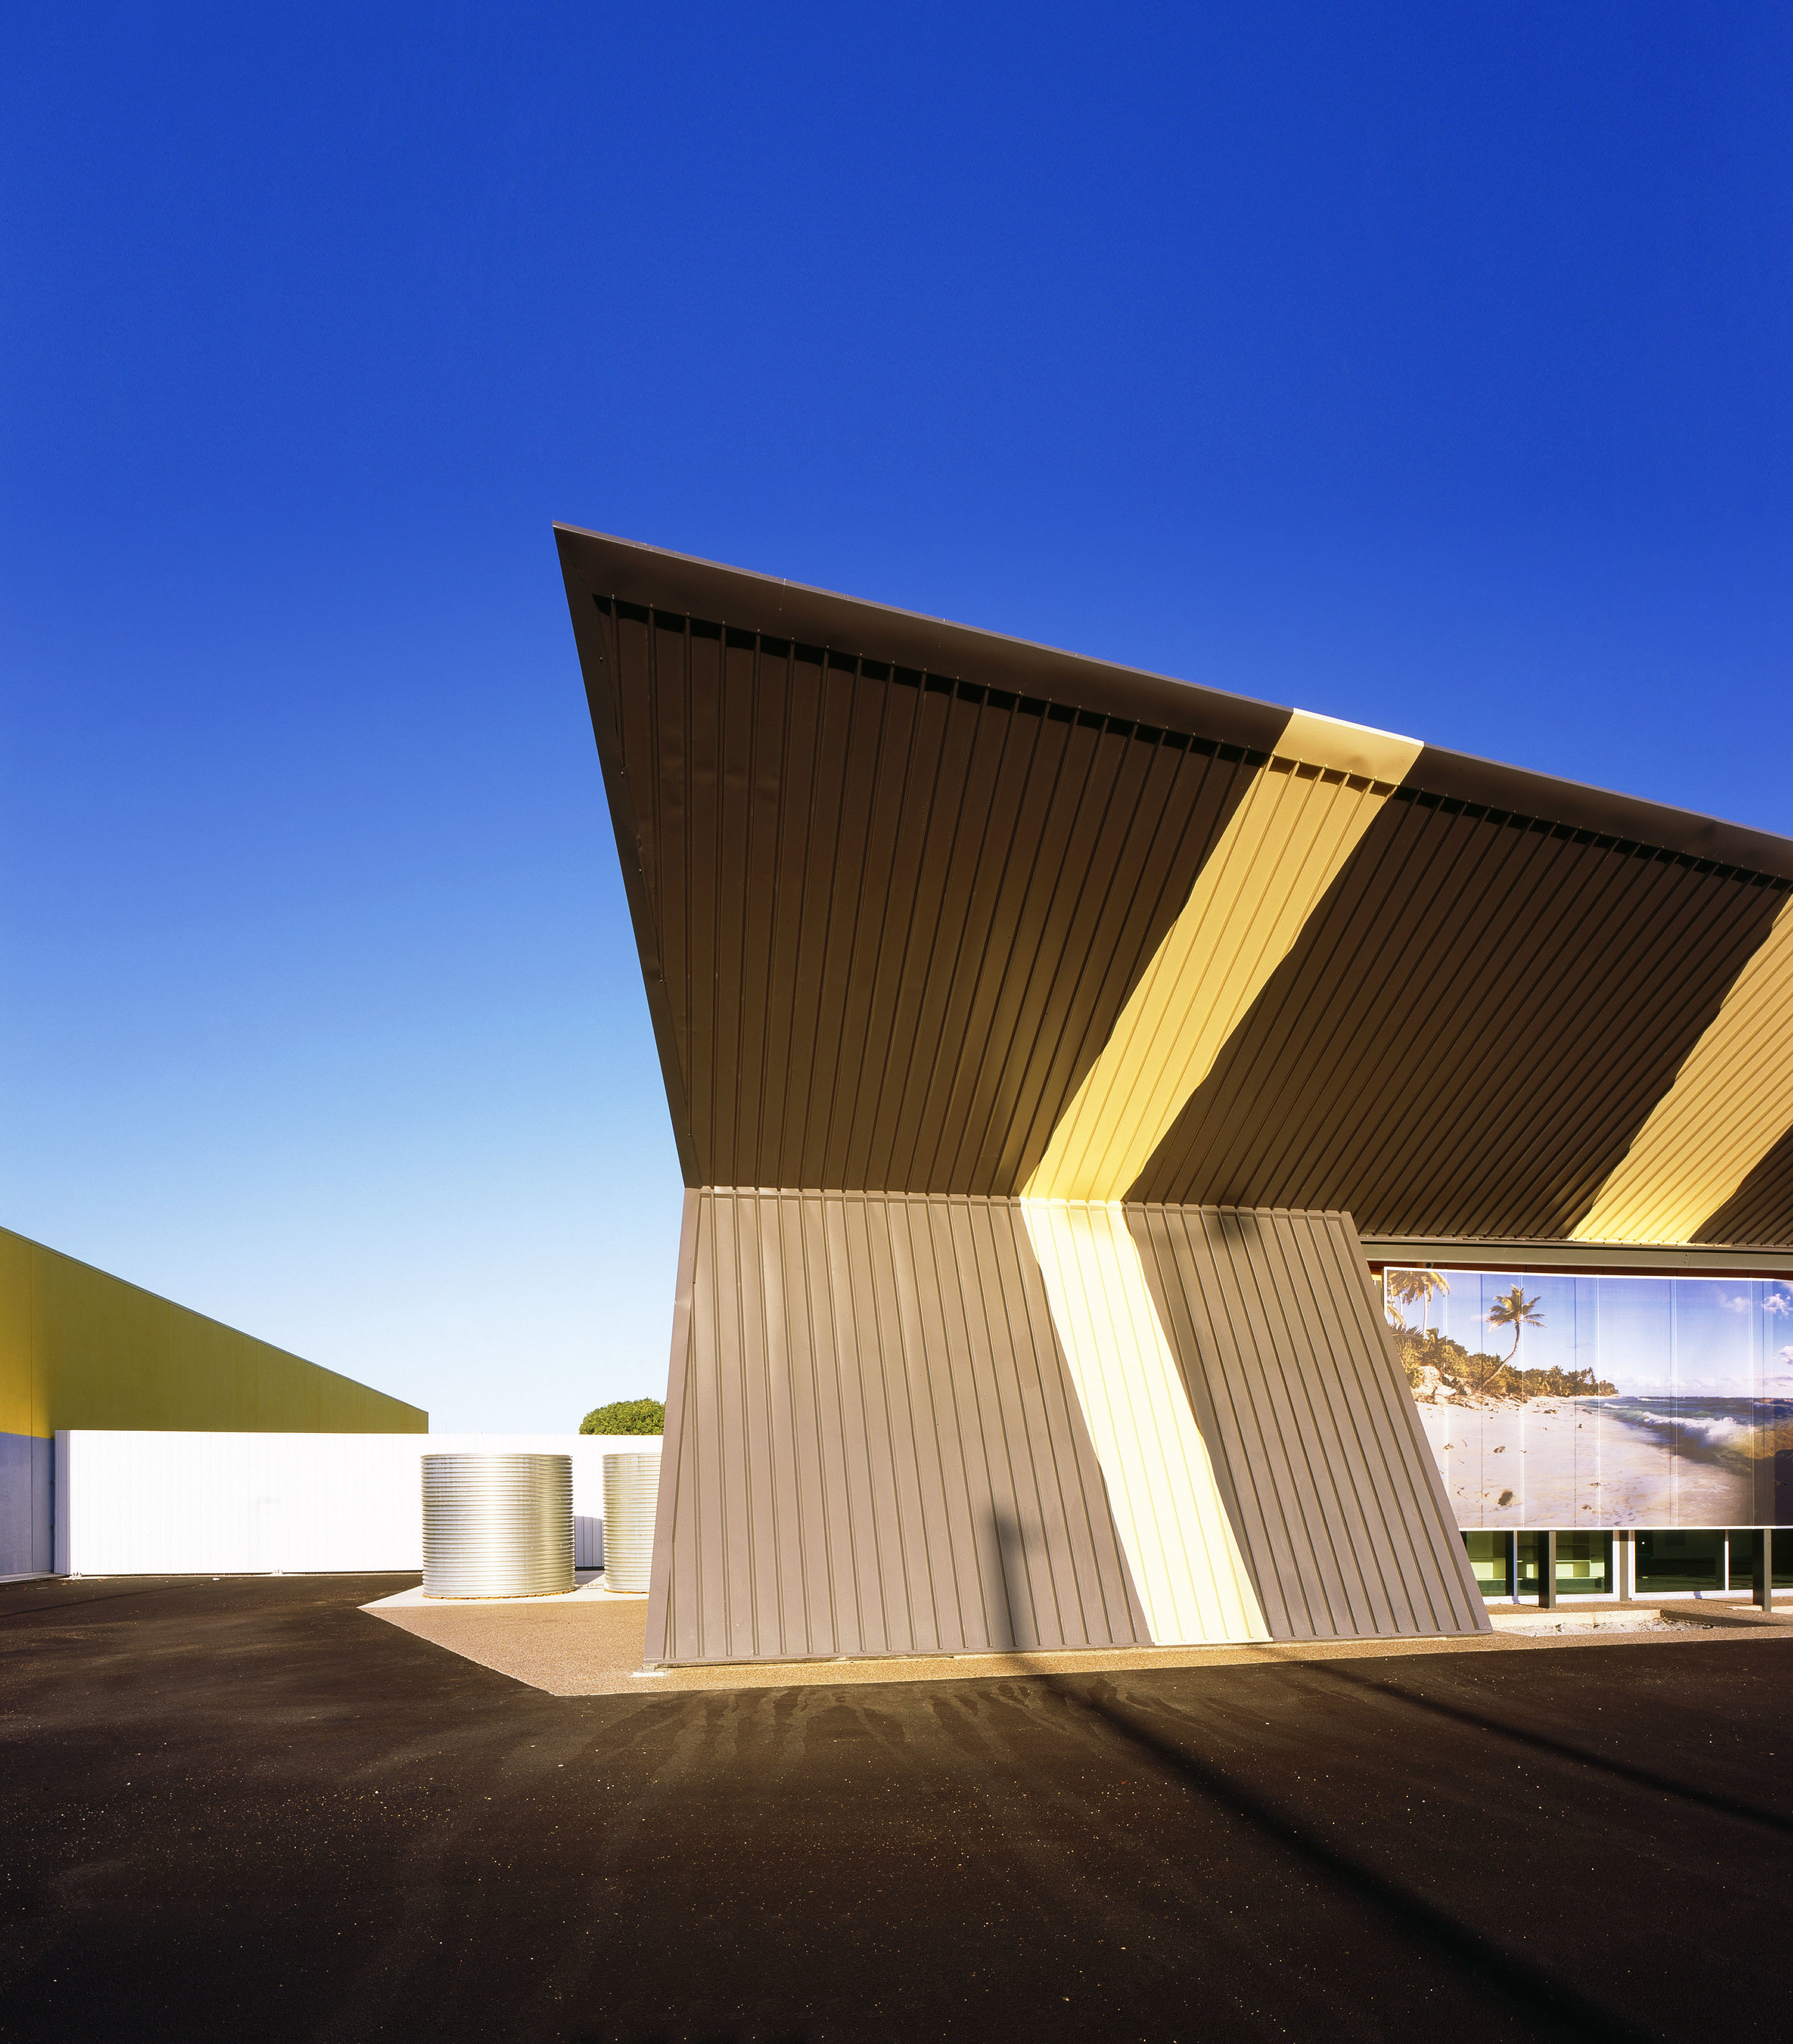 Guymer-bailey-architects-4WD-opposite-lock-03.jpg